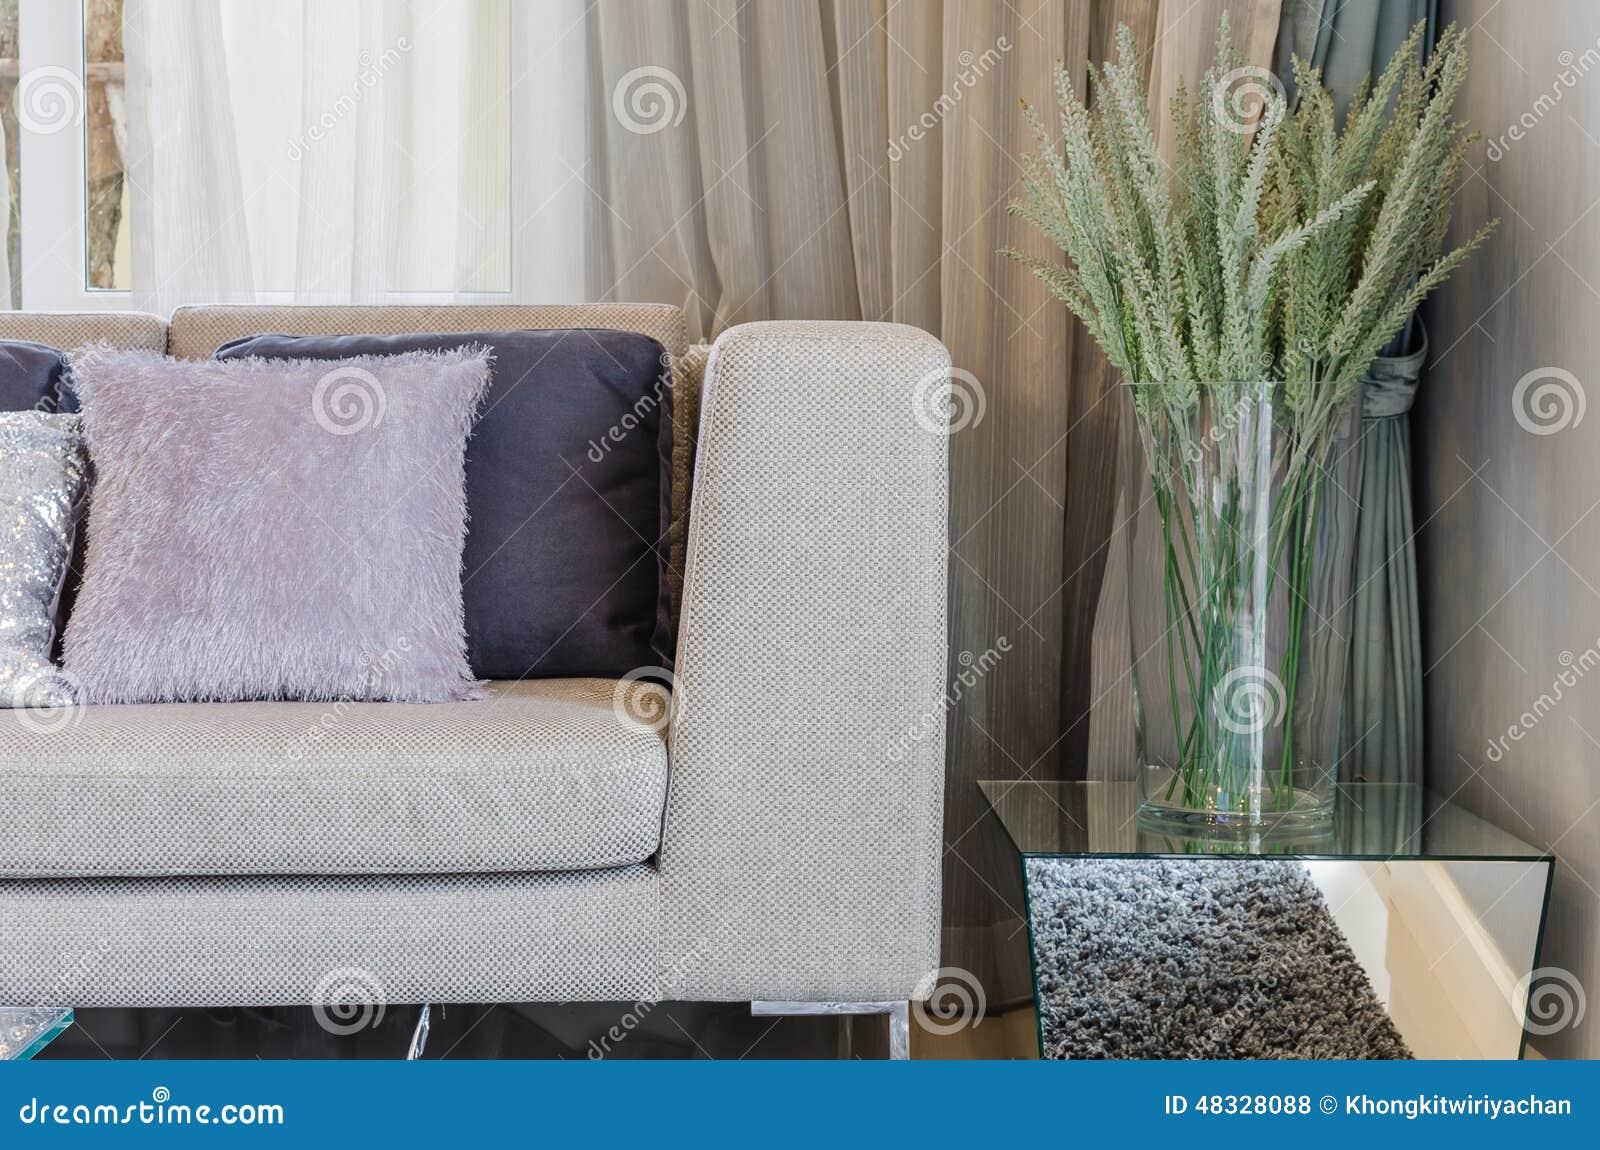 Stunning vasi d arredo per interni with vasi d arredo per for Vasi grandi per interni